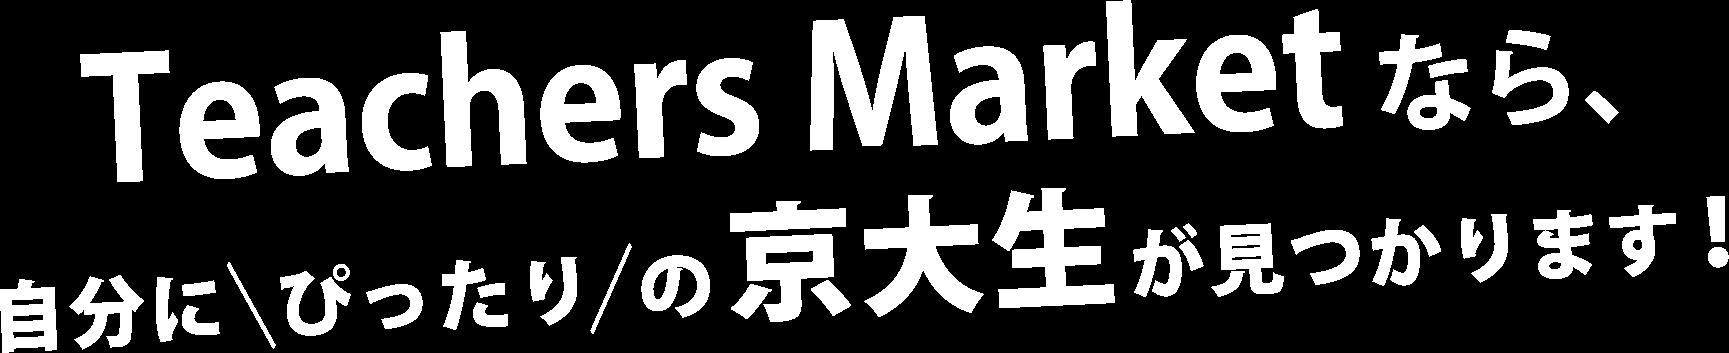 Teachers Marketなら、自分にぴったりの京都大学生が見つかります!